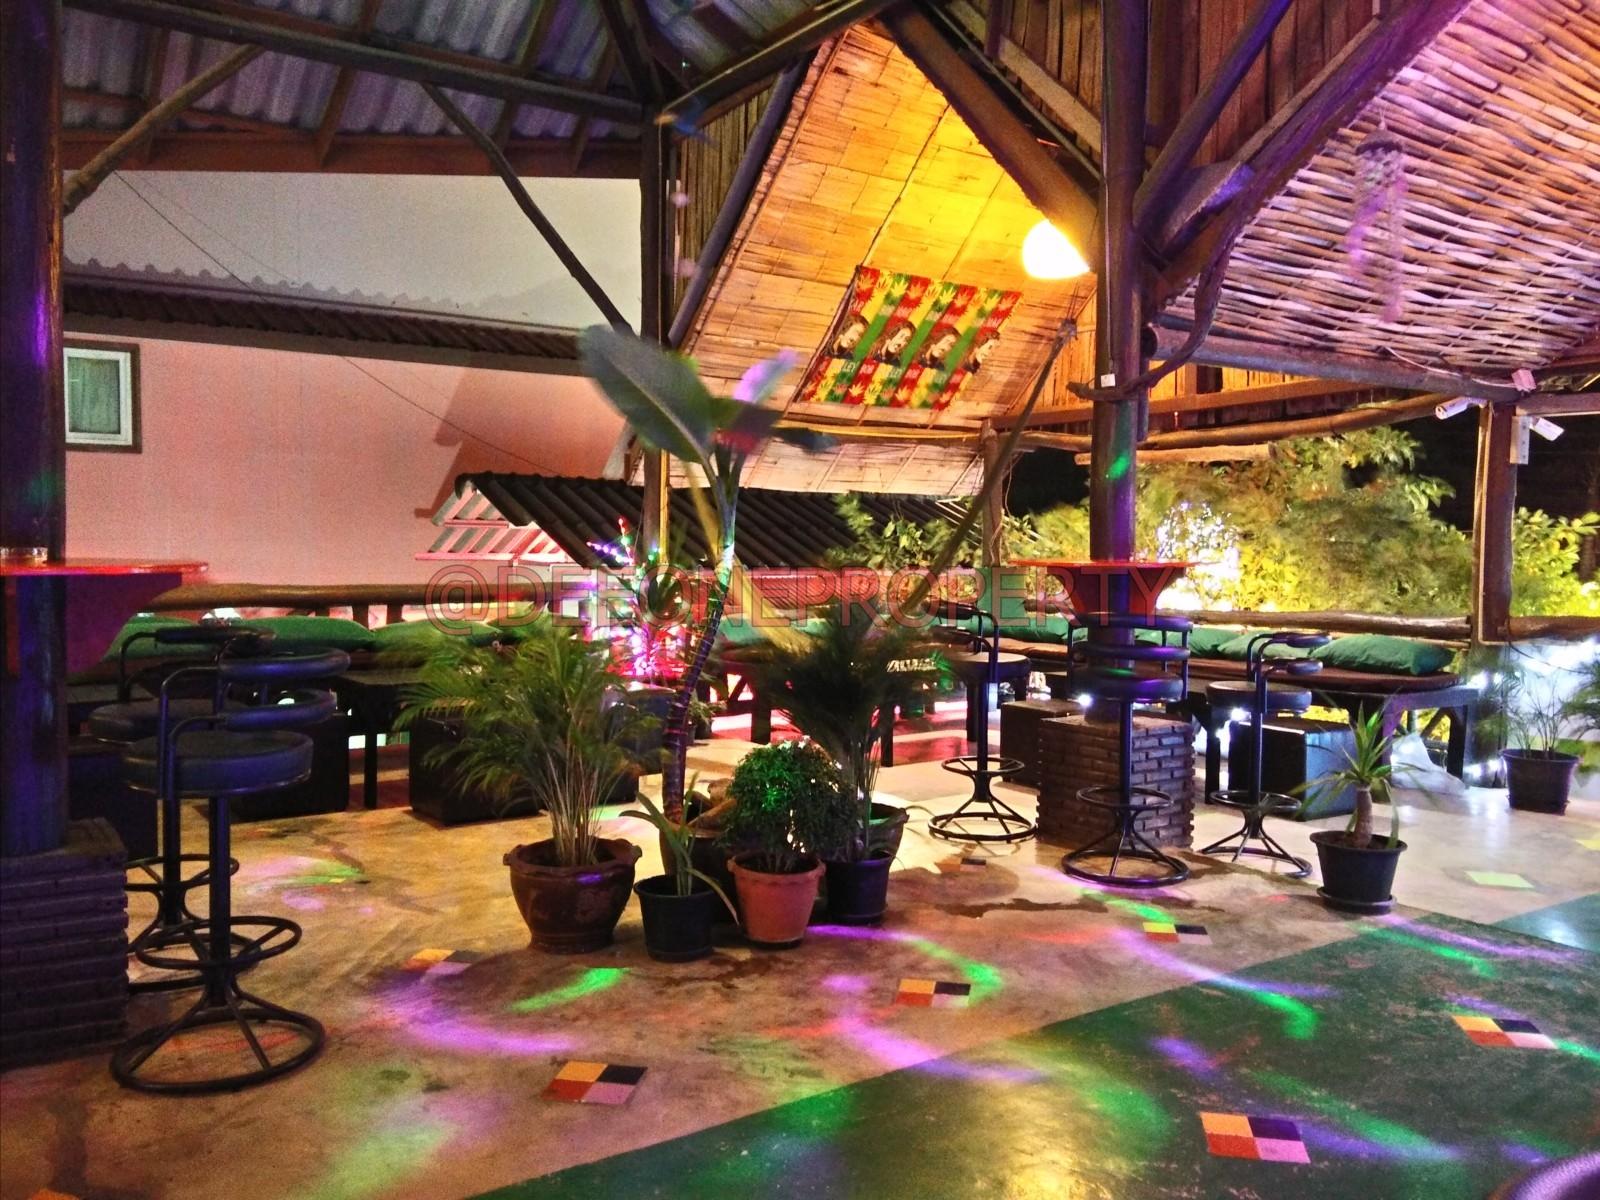 *DISCOUNT* Продается бар-ресторан – Клонг Прао (Klong Prao), Ко Чанг